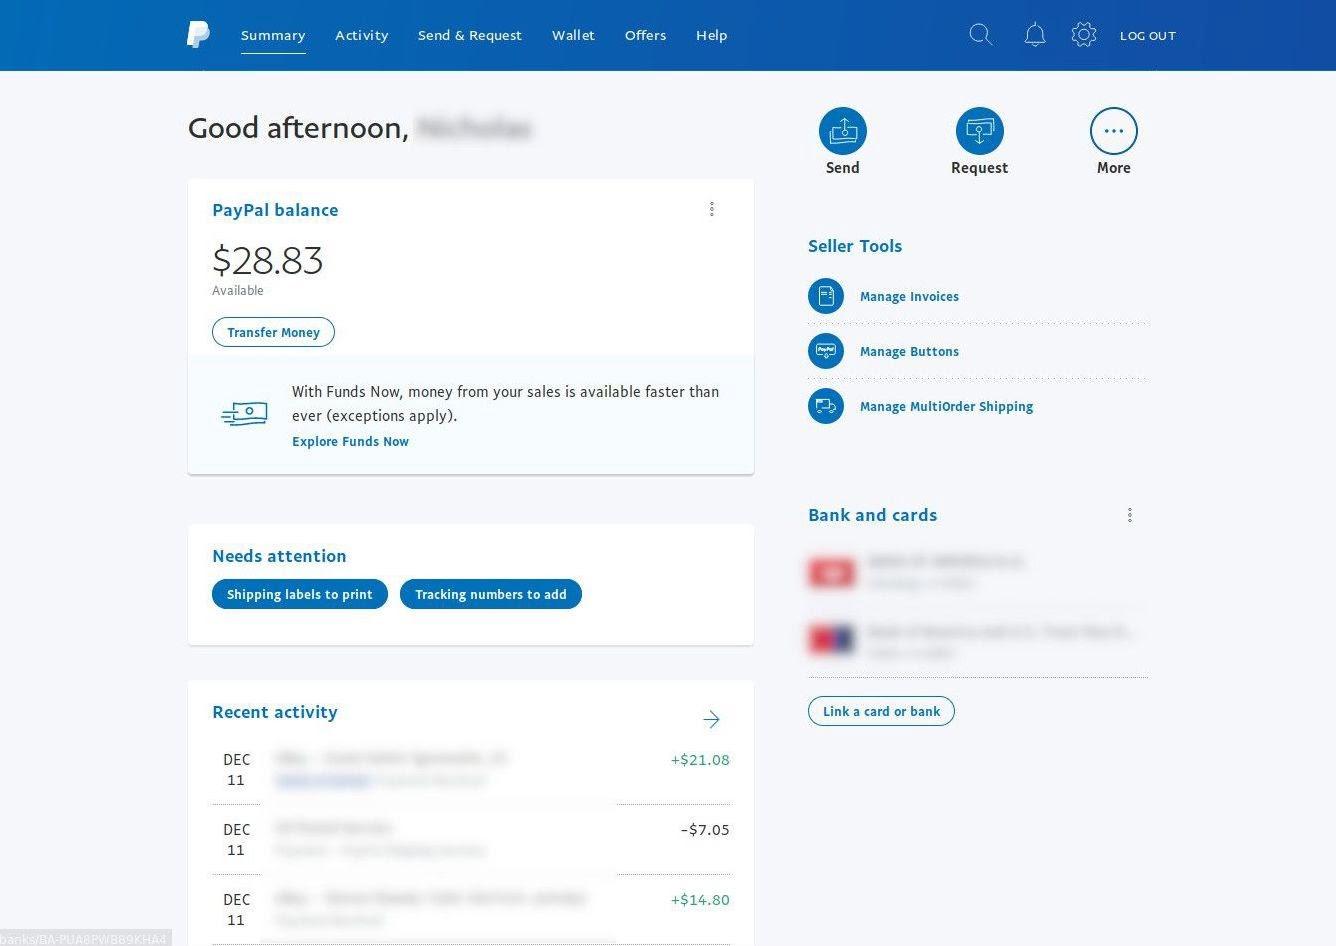 PayPal dashboard UI